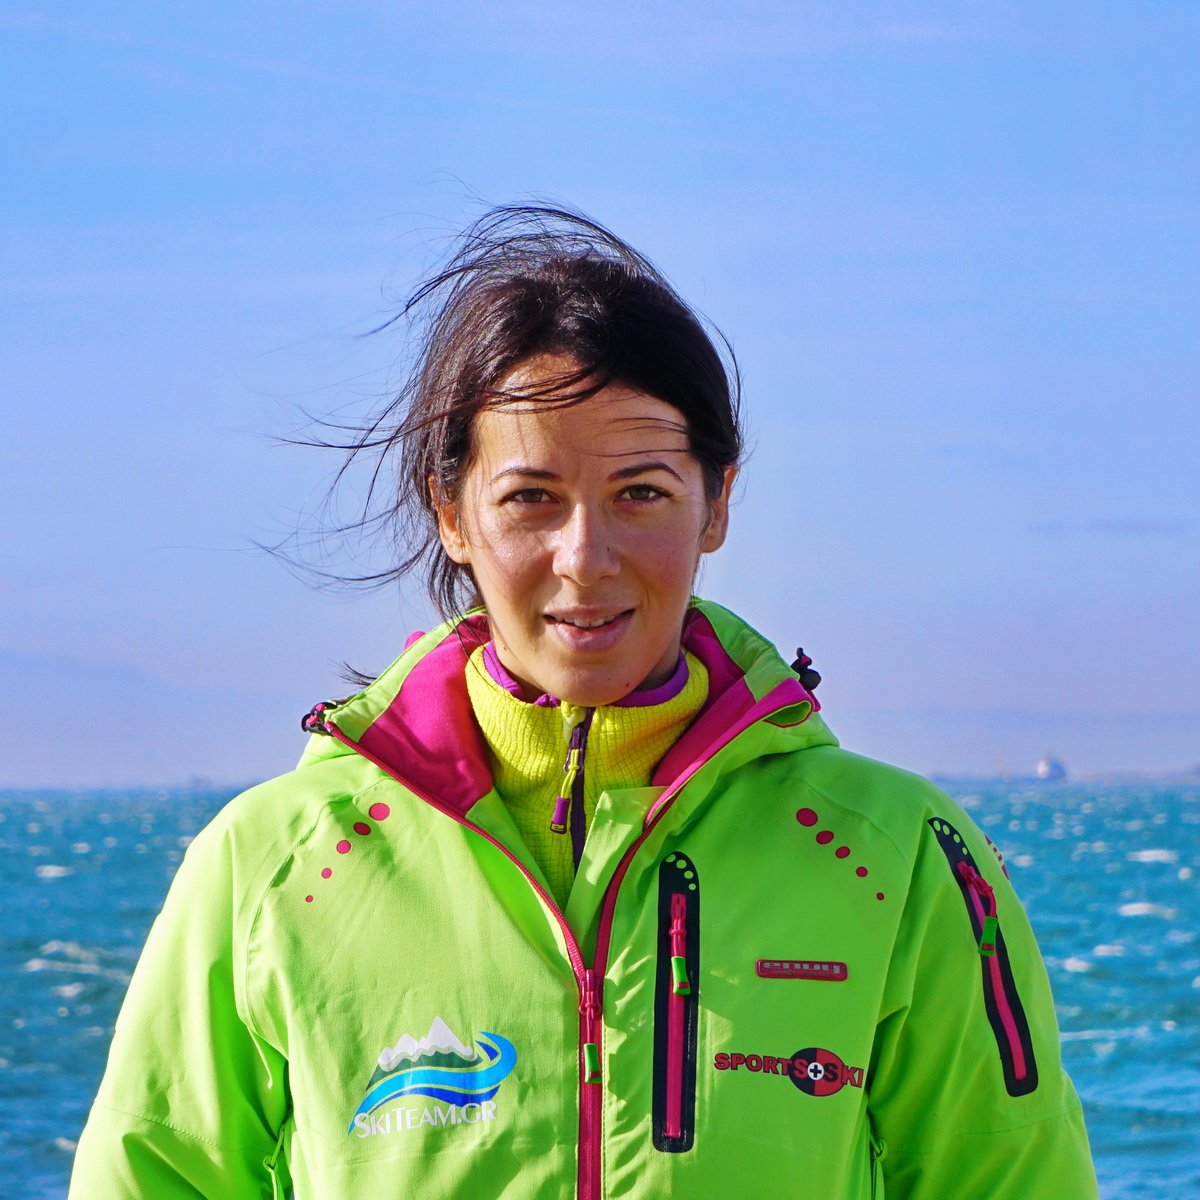 SkiTeam ακαδημία και σχολή σκι για παιδιά και ενηλίκους στη Θεσσαλονίκη